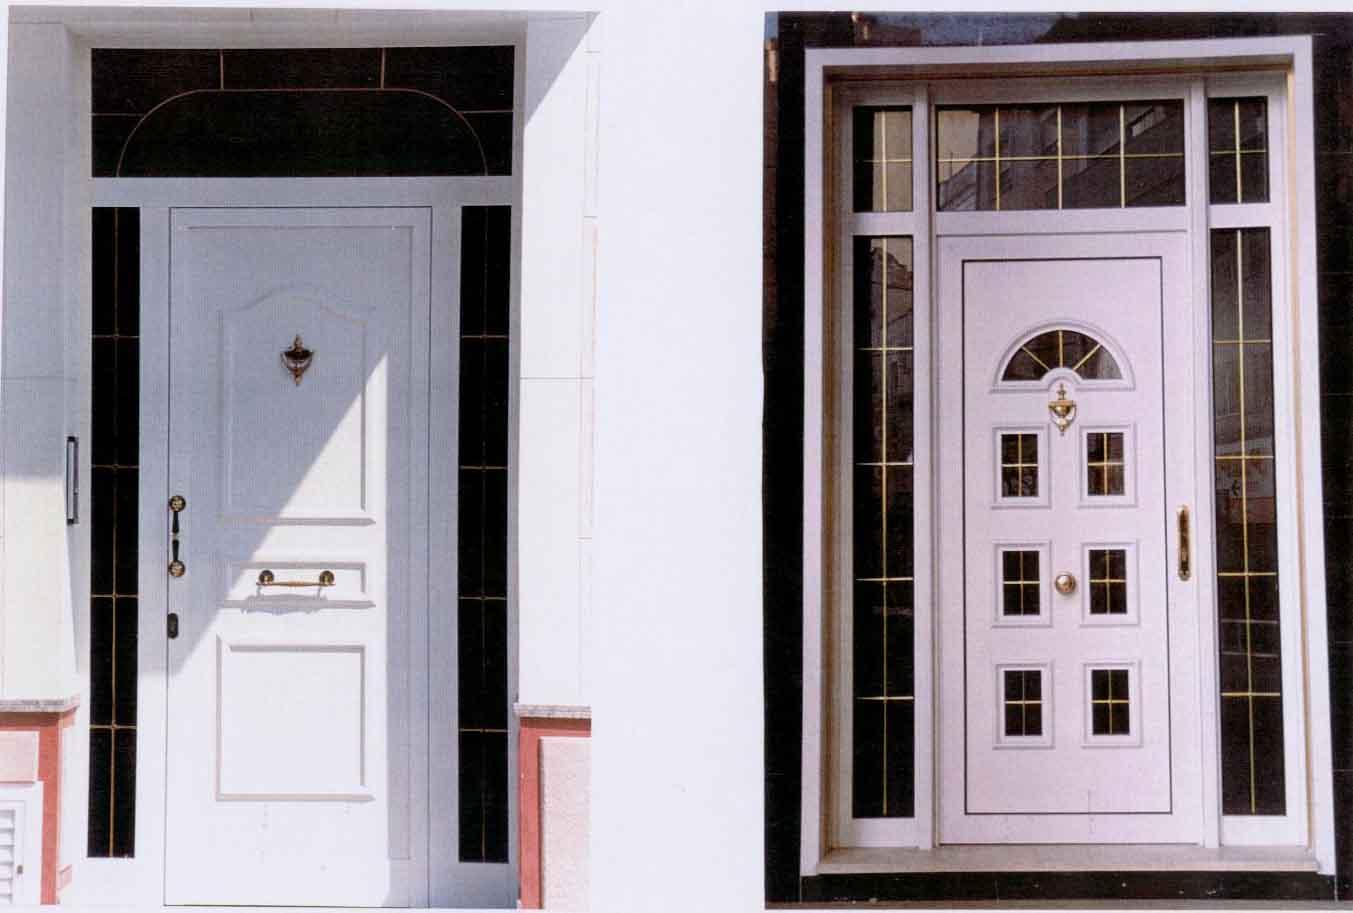 Imagenes de puertas de aluminio imagui - Puerta balconera aluminio ...